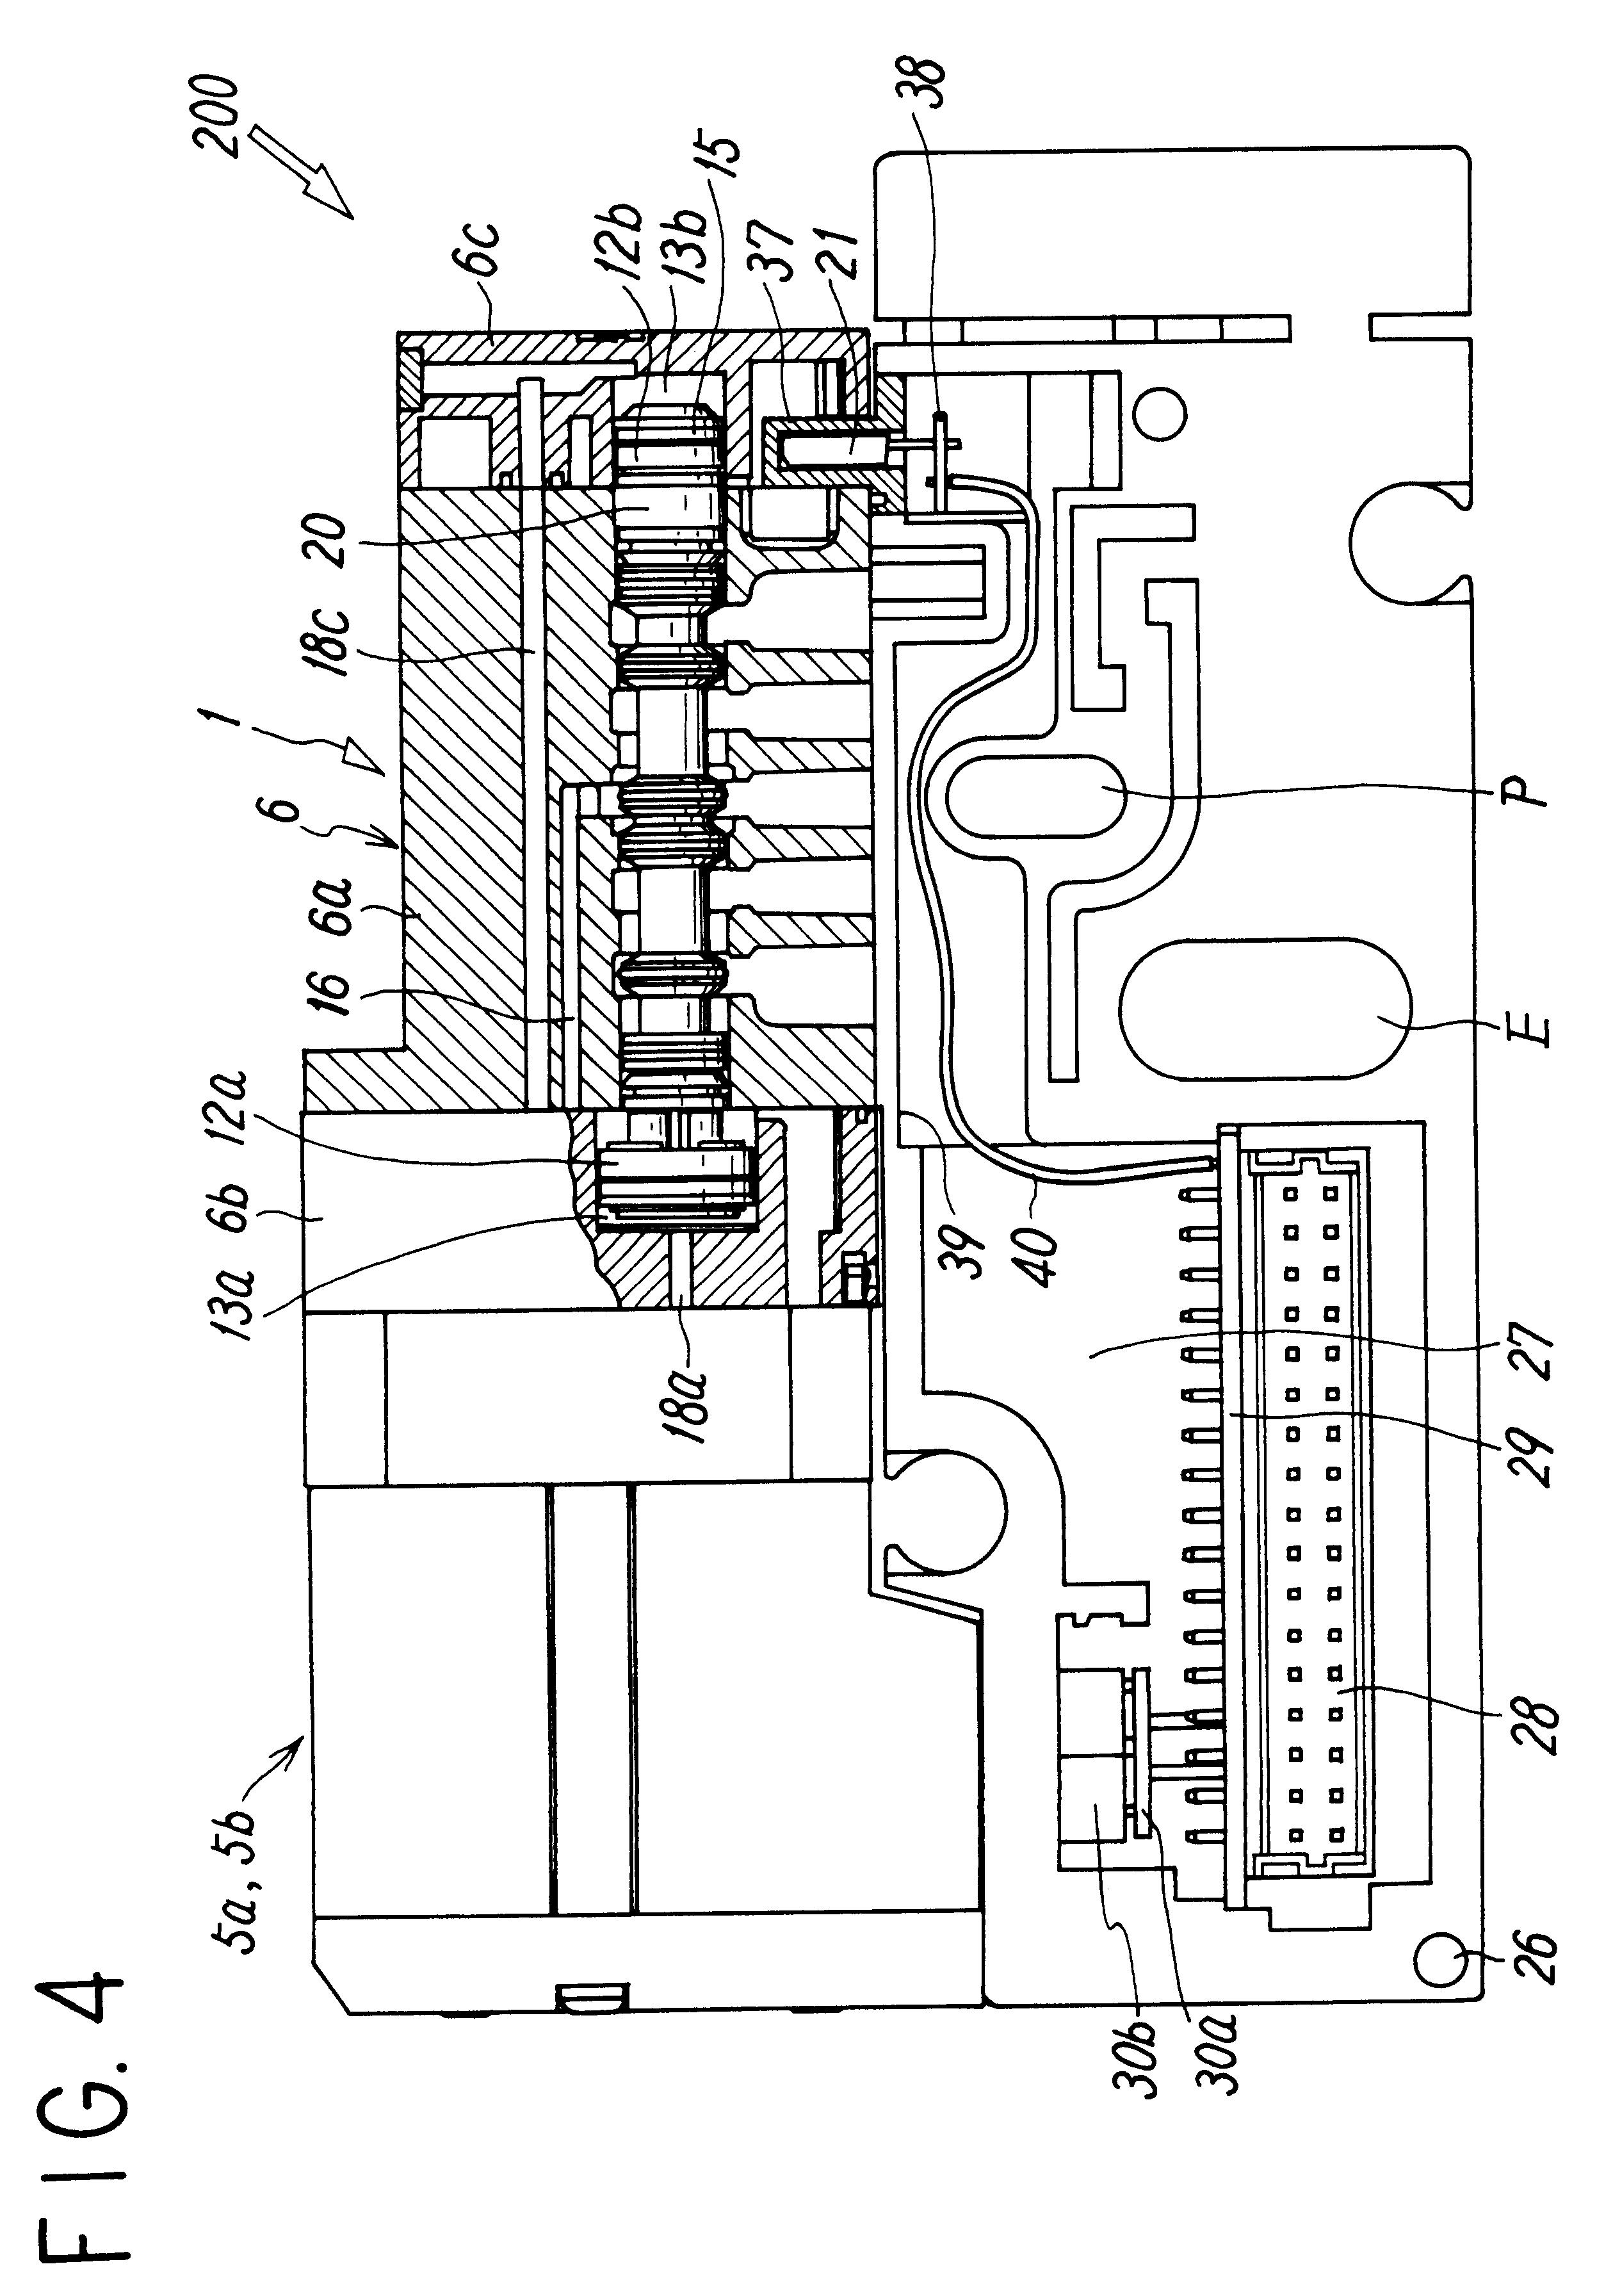 Patent Us6520202 Manifold Valve Having Position Detecting Function Smc Wiring Diagram Drawing